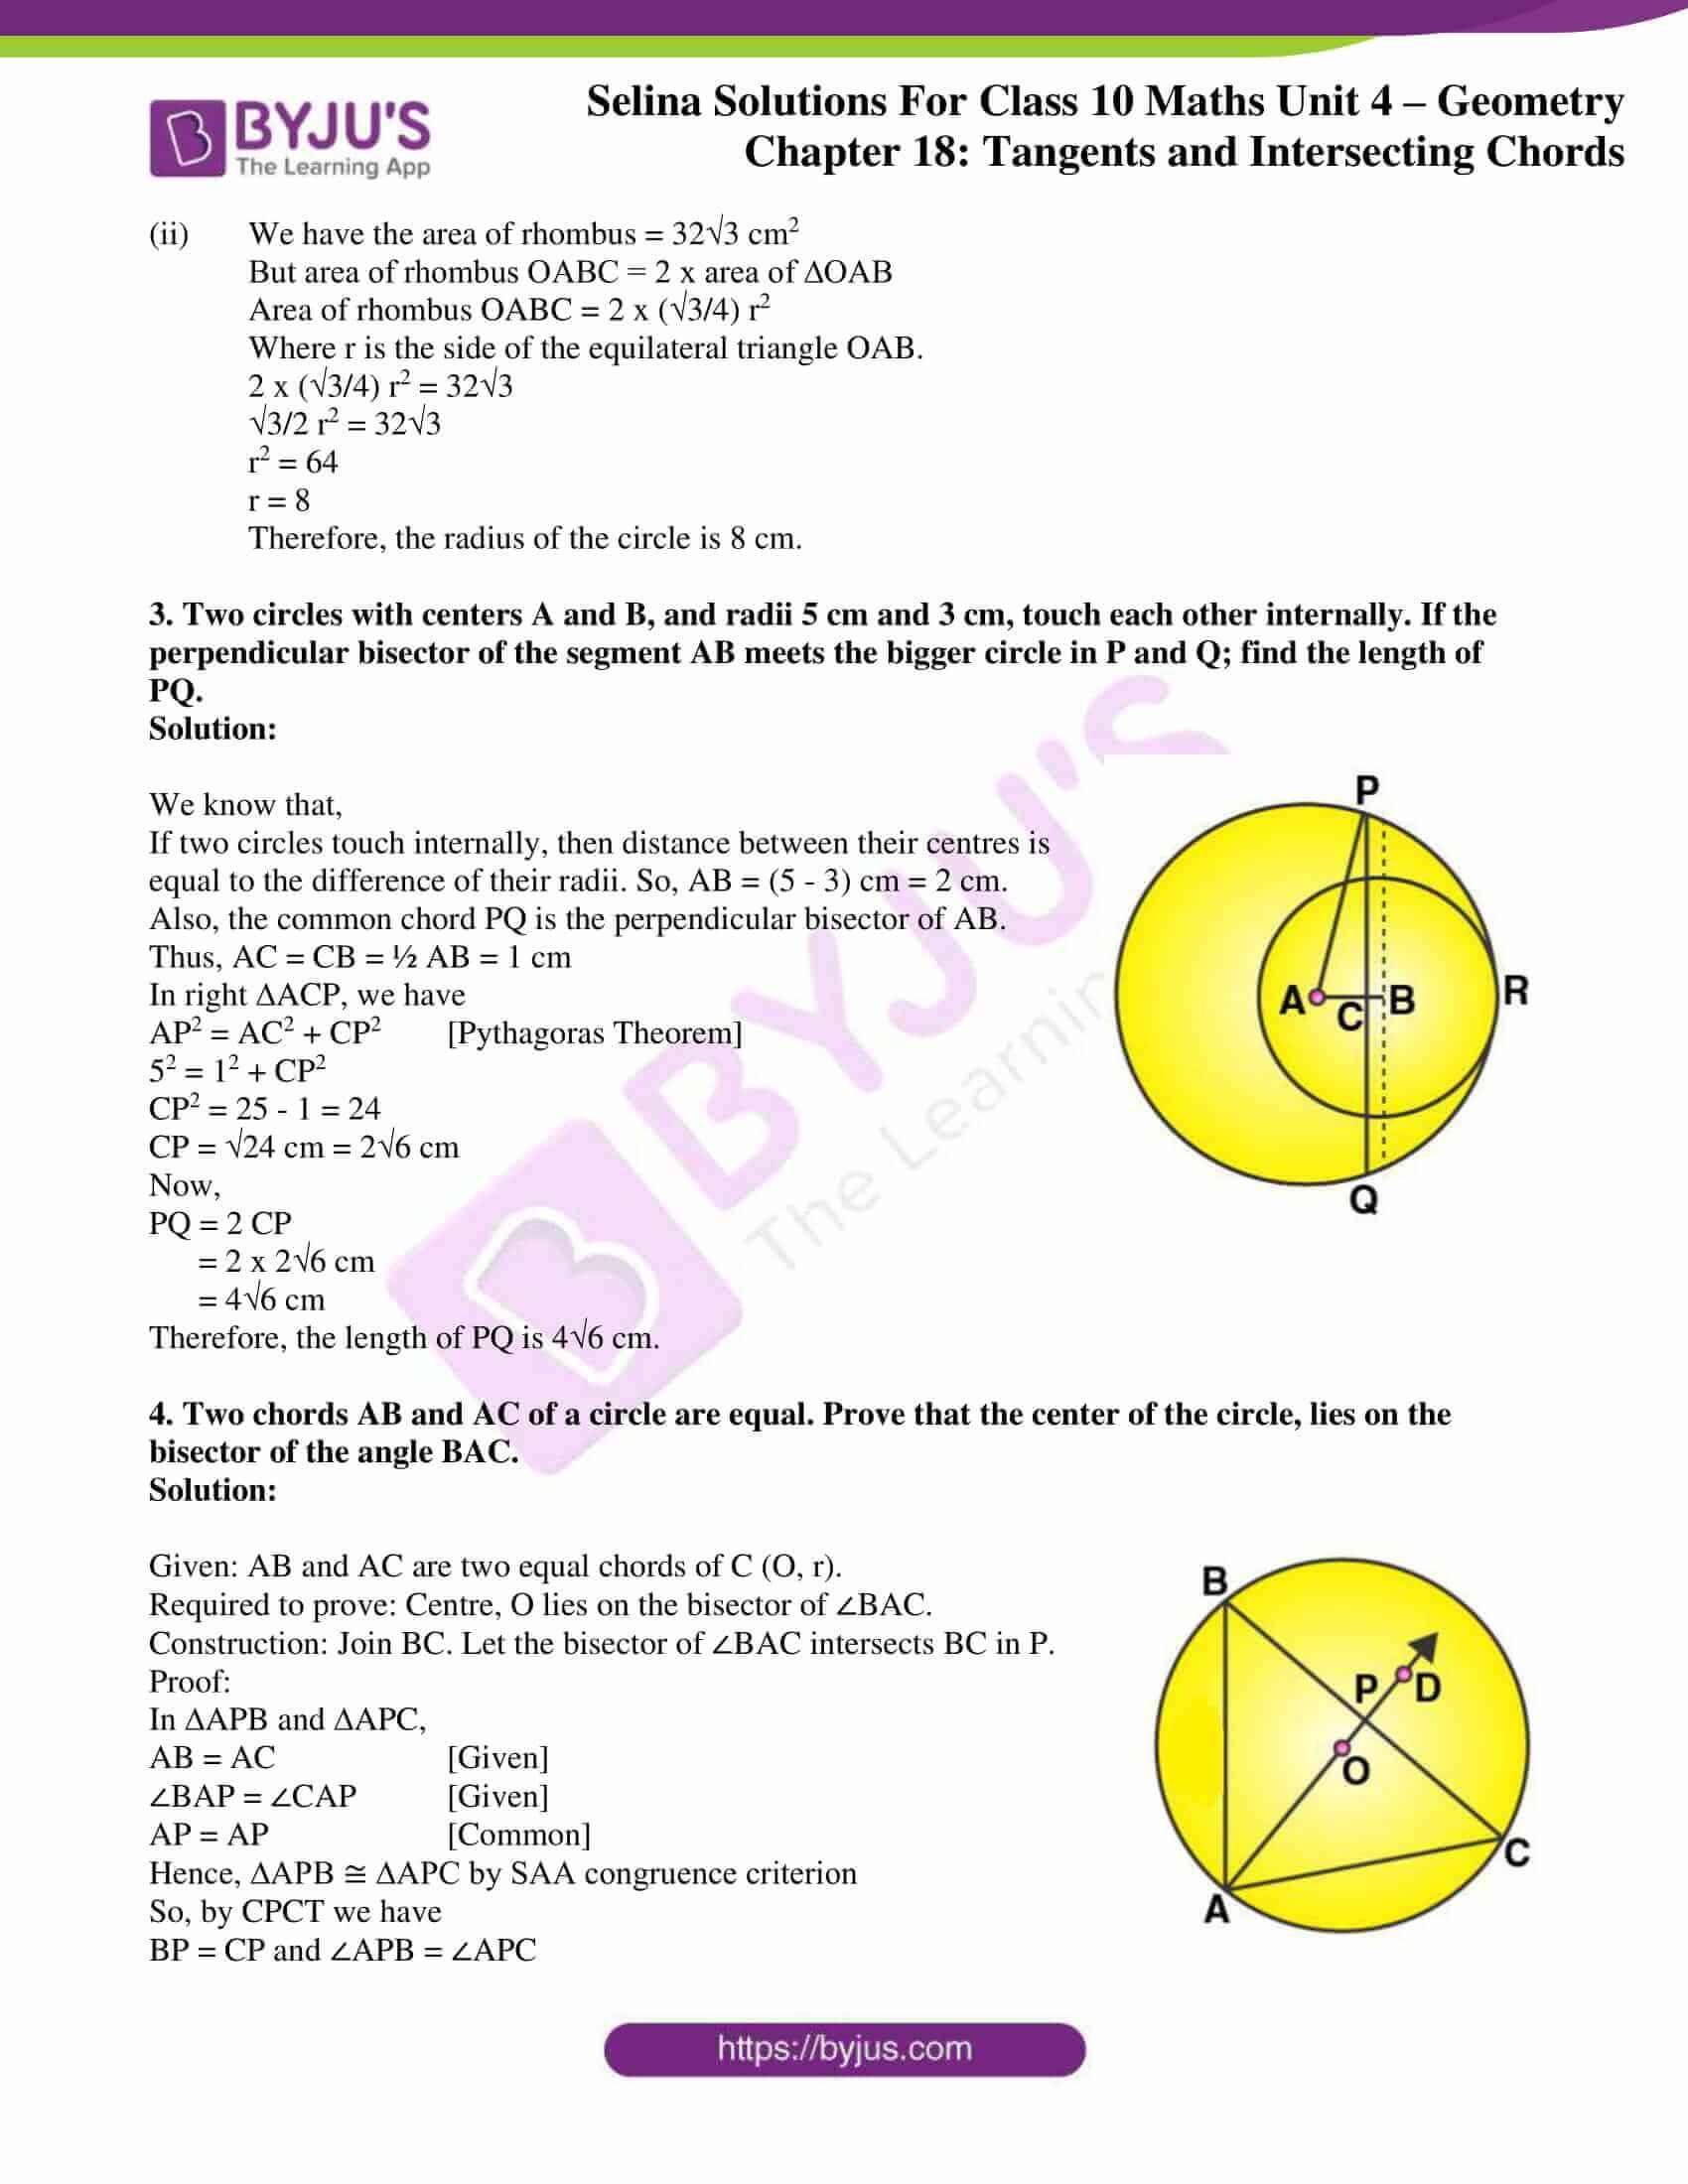 selina-sol-maths-class-10-ch-18-ex-c-02